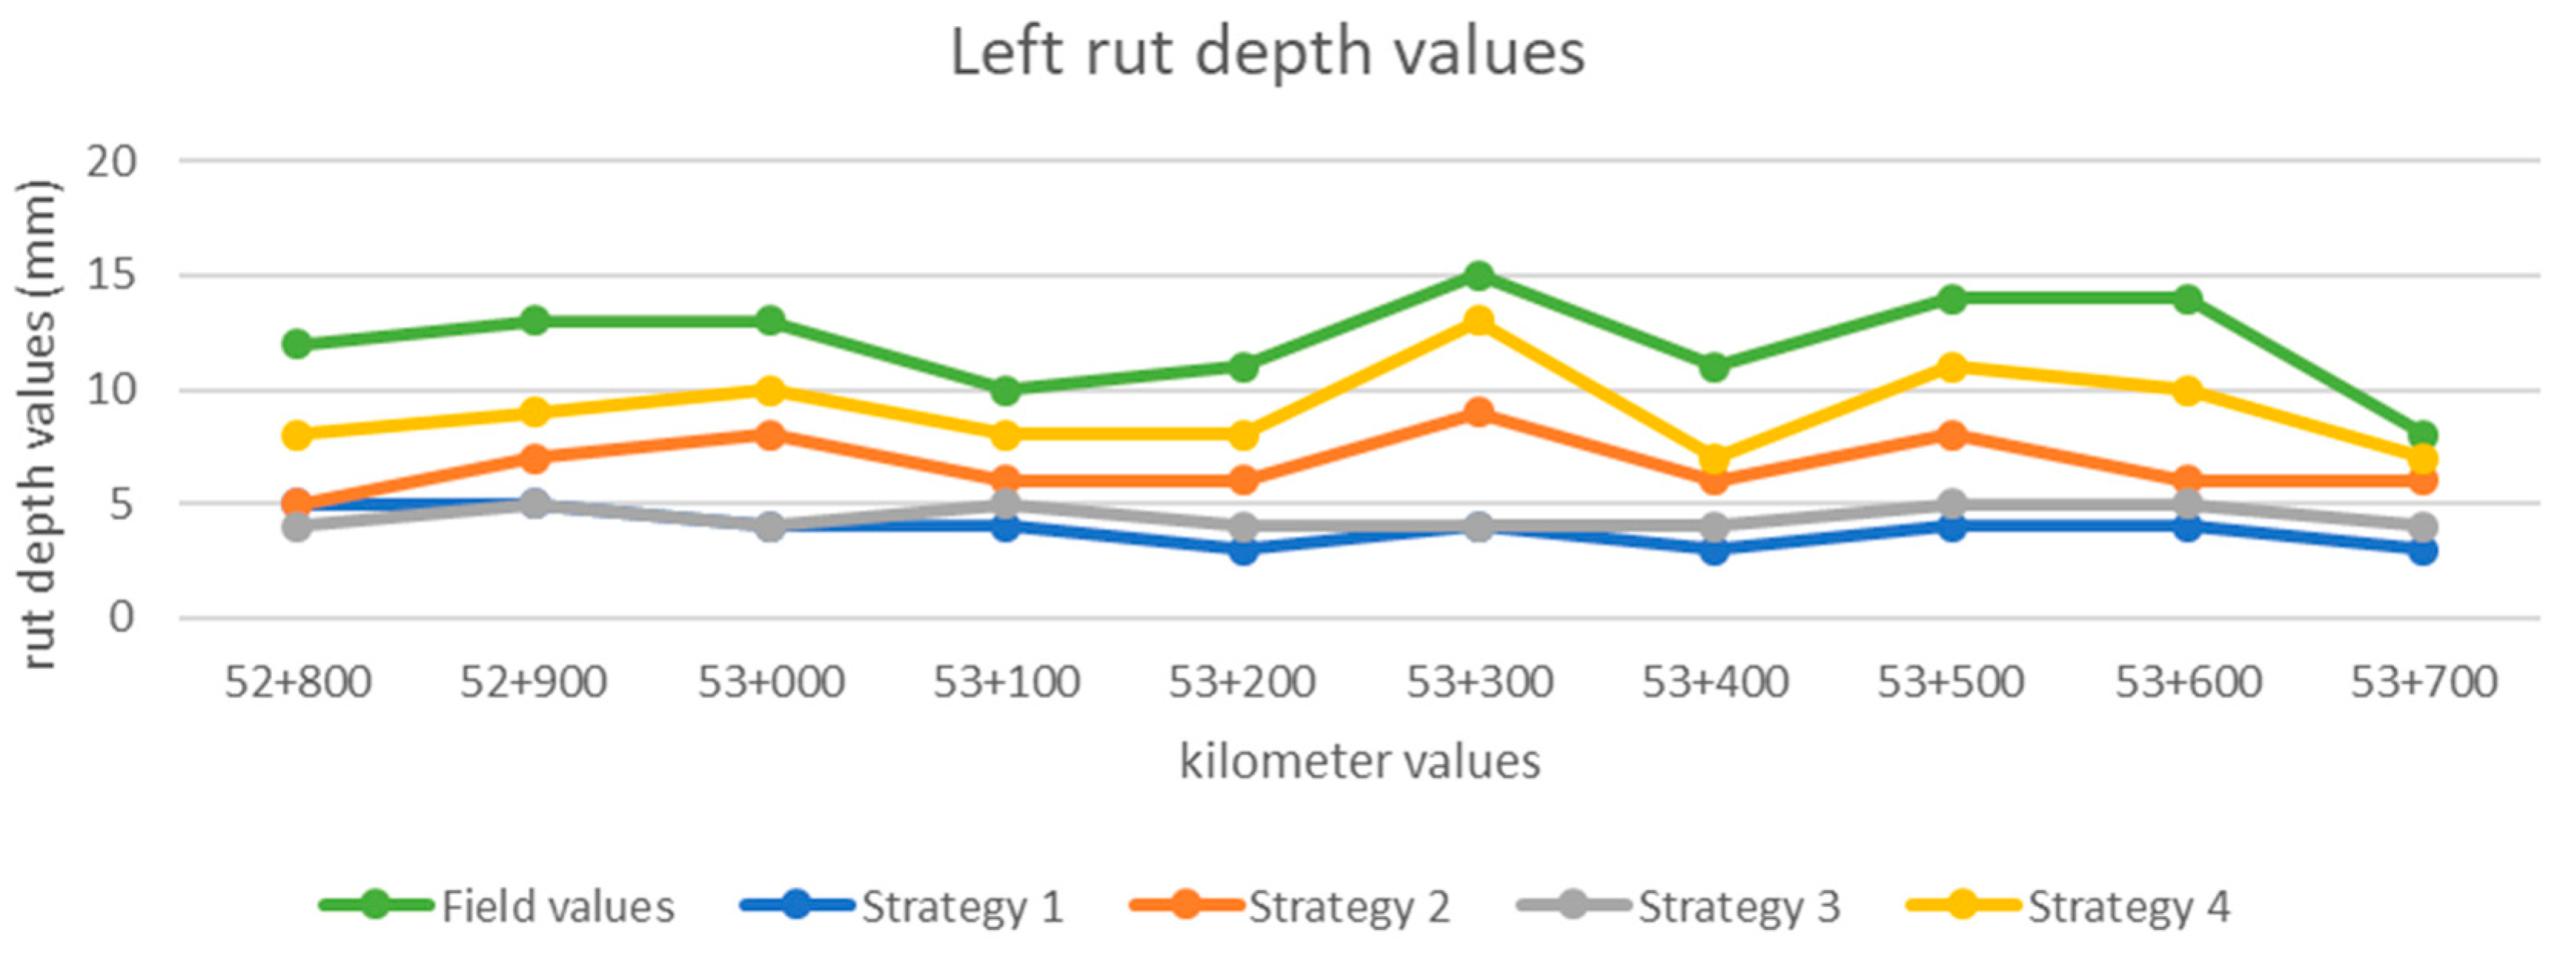 Ijgi | Free Full-Text | Road Rutting Measurement Using pertaining to 2021 Pa Rut Predictions